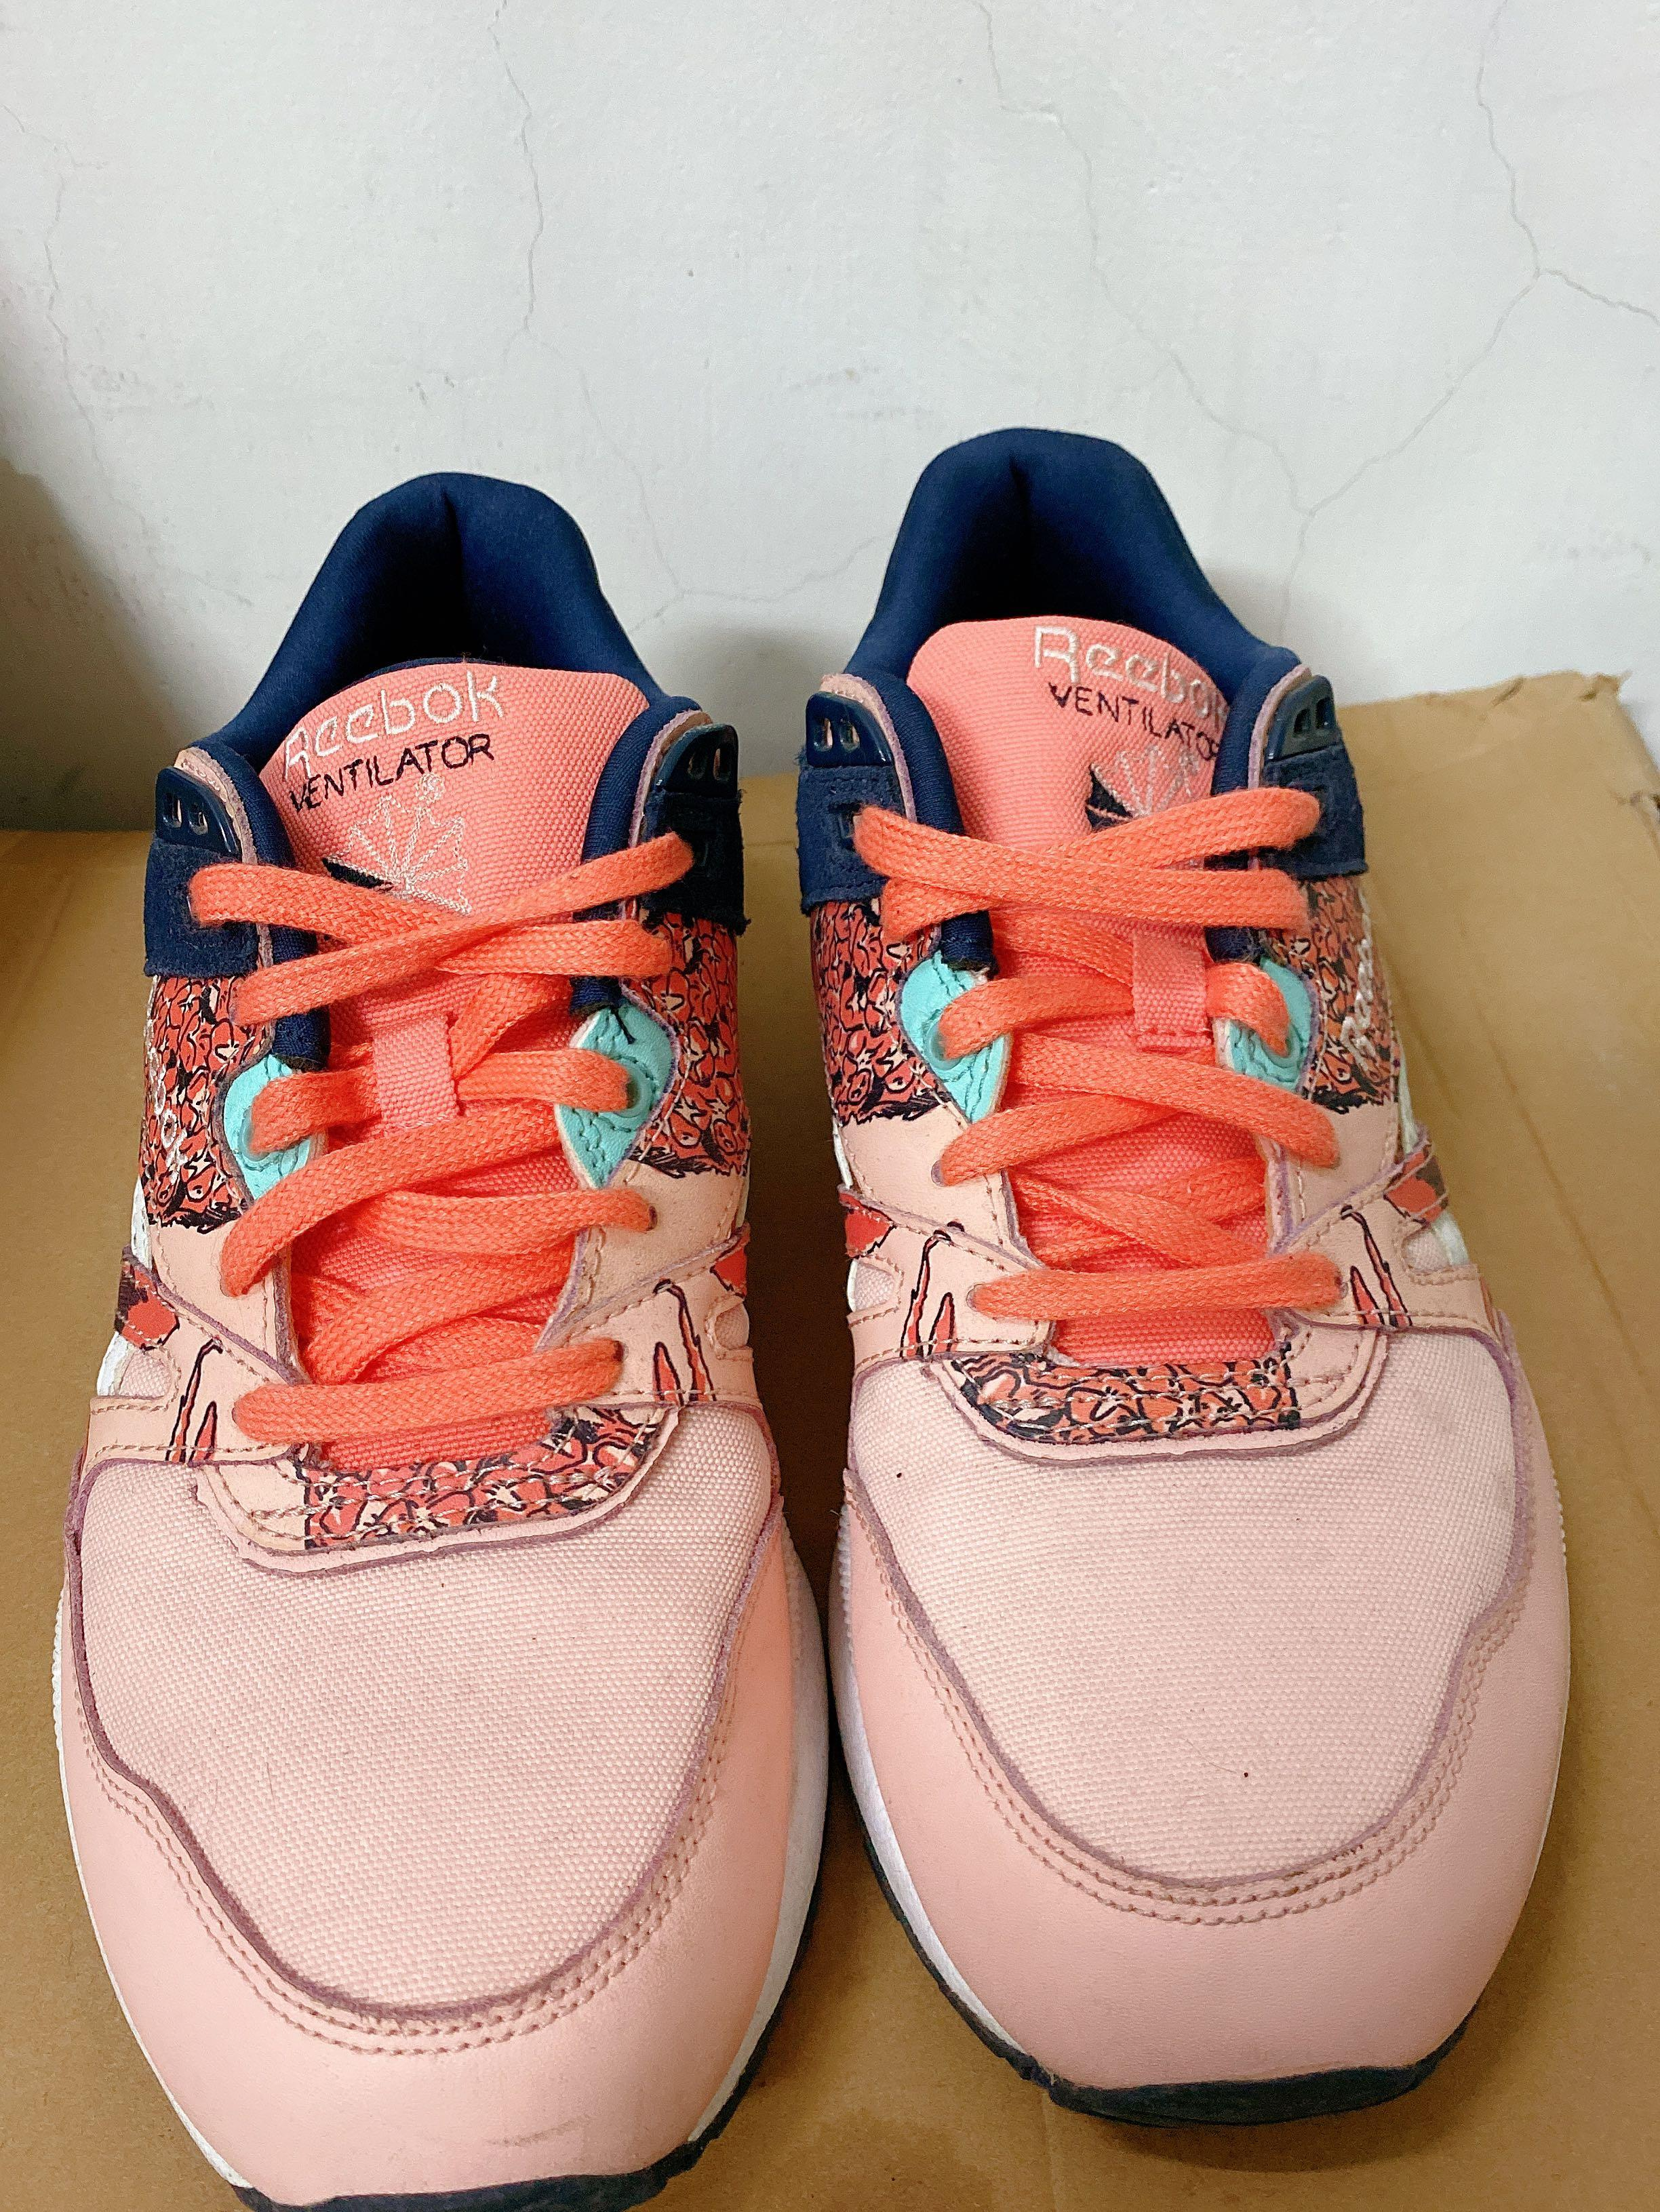 REEBOK-VENTILATOR 女慢跑鞋 紅橘粉(含運)